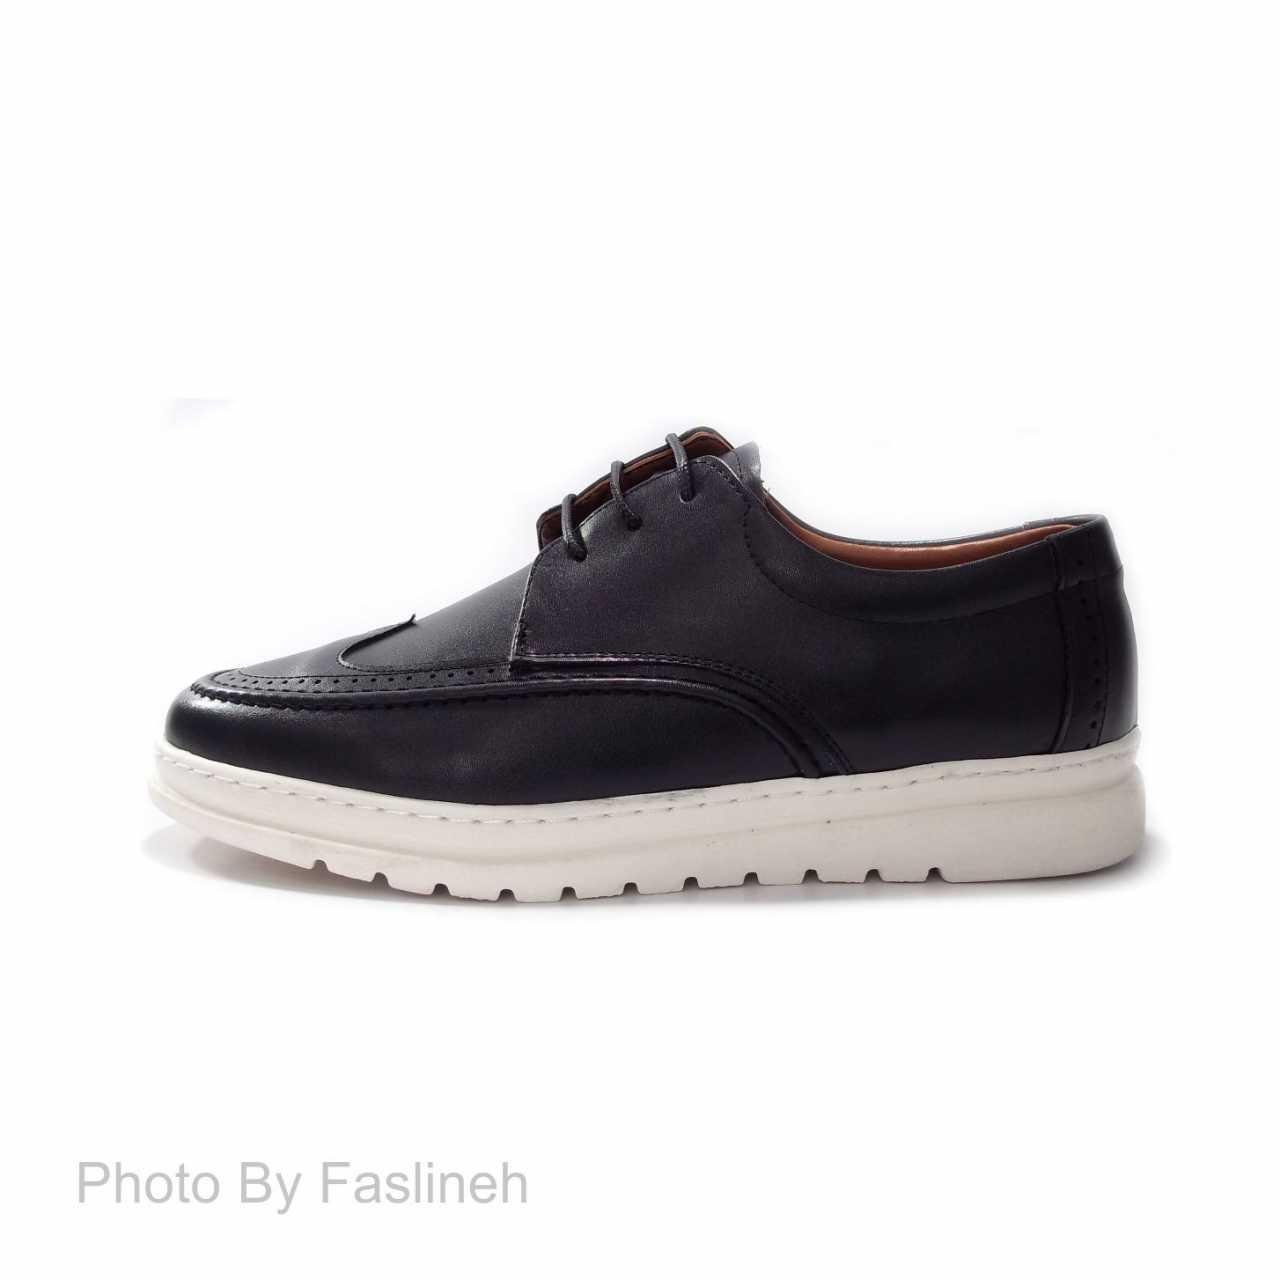 کفش اسپرت طرح هشترک CN854  مشکی